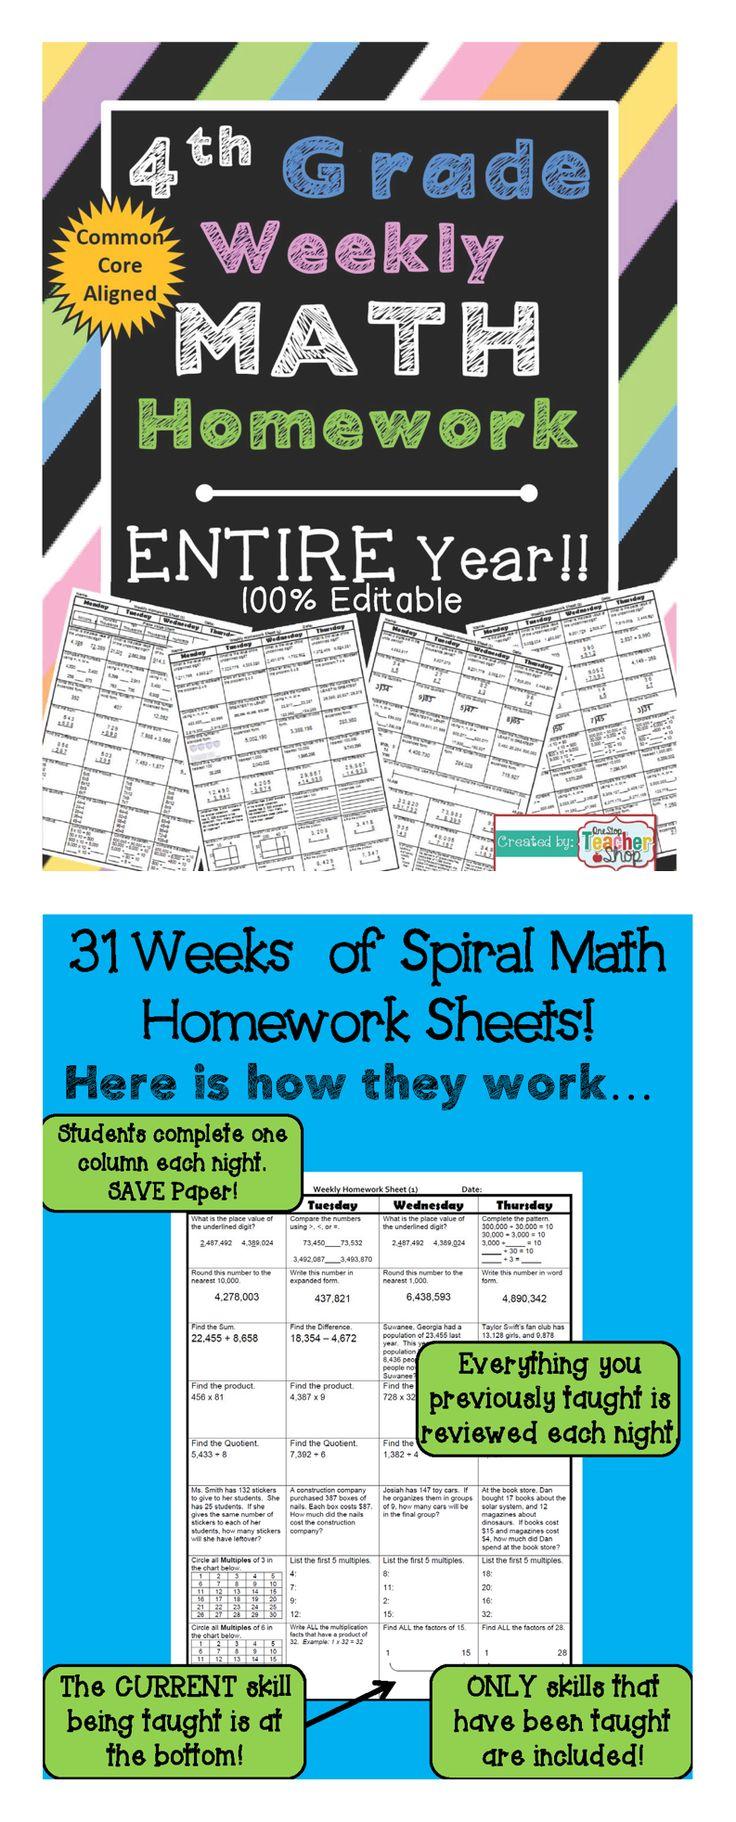 18 best 4th grade images on Pinterest | Teaching ideas, Morning work ...